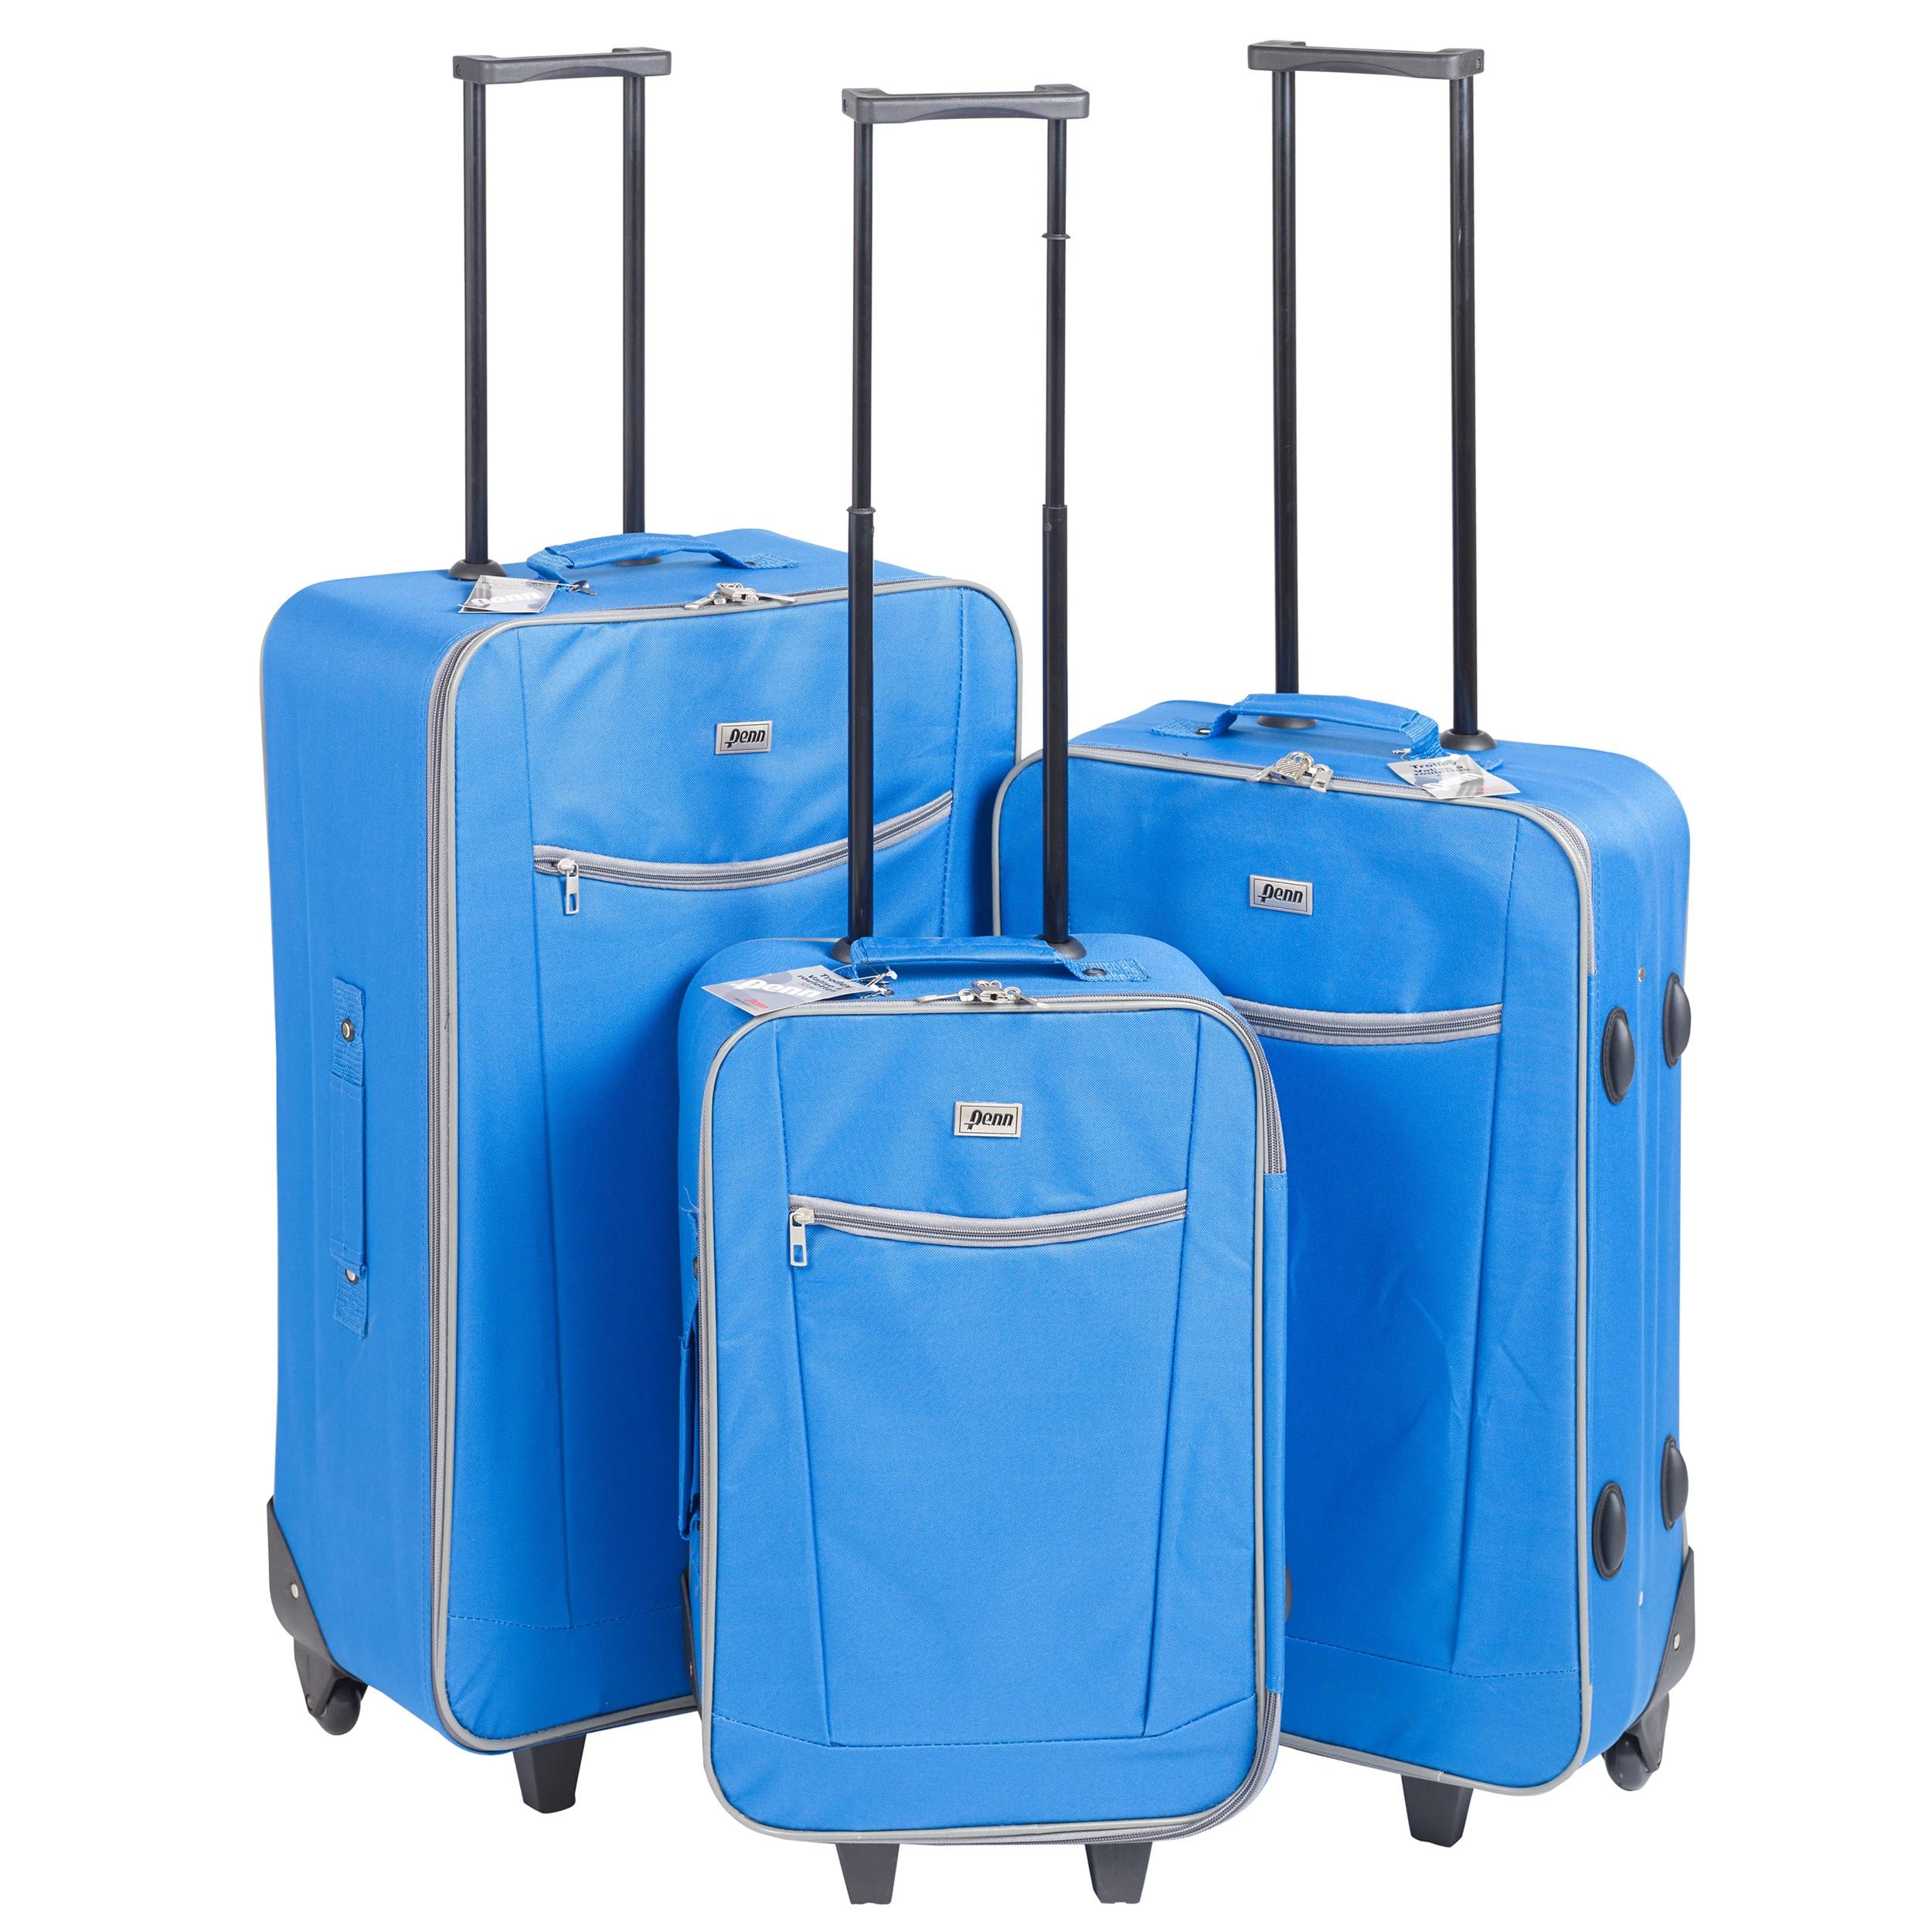 3 x Penn Lightweight Trolley Wheel Suitcase Luggage Travel ...